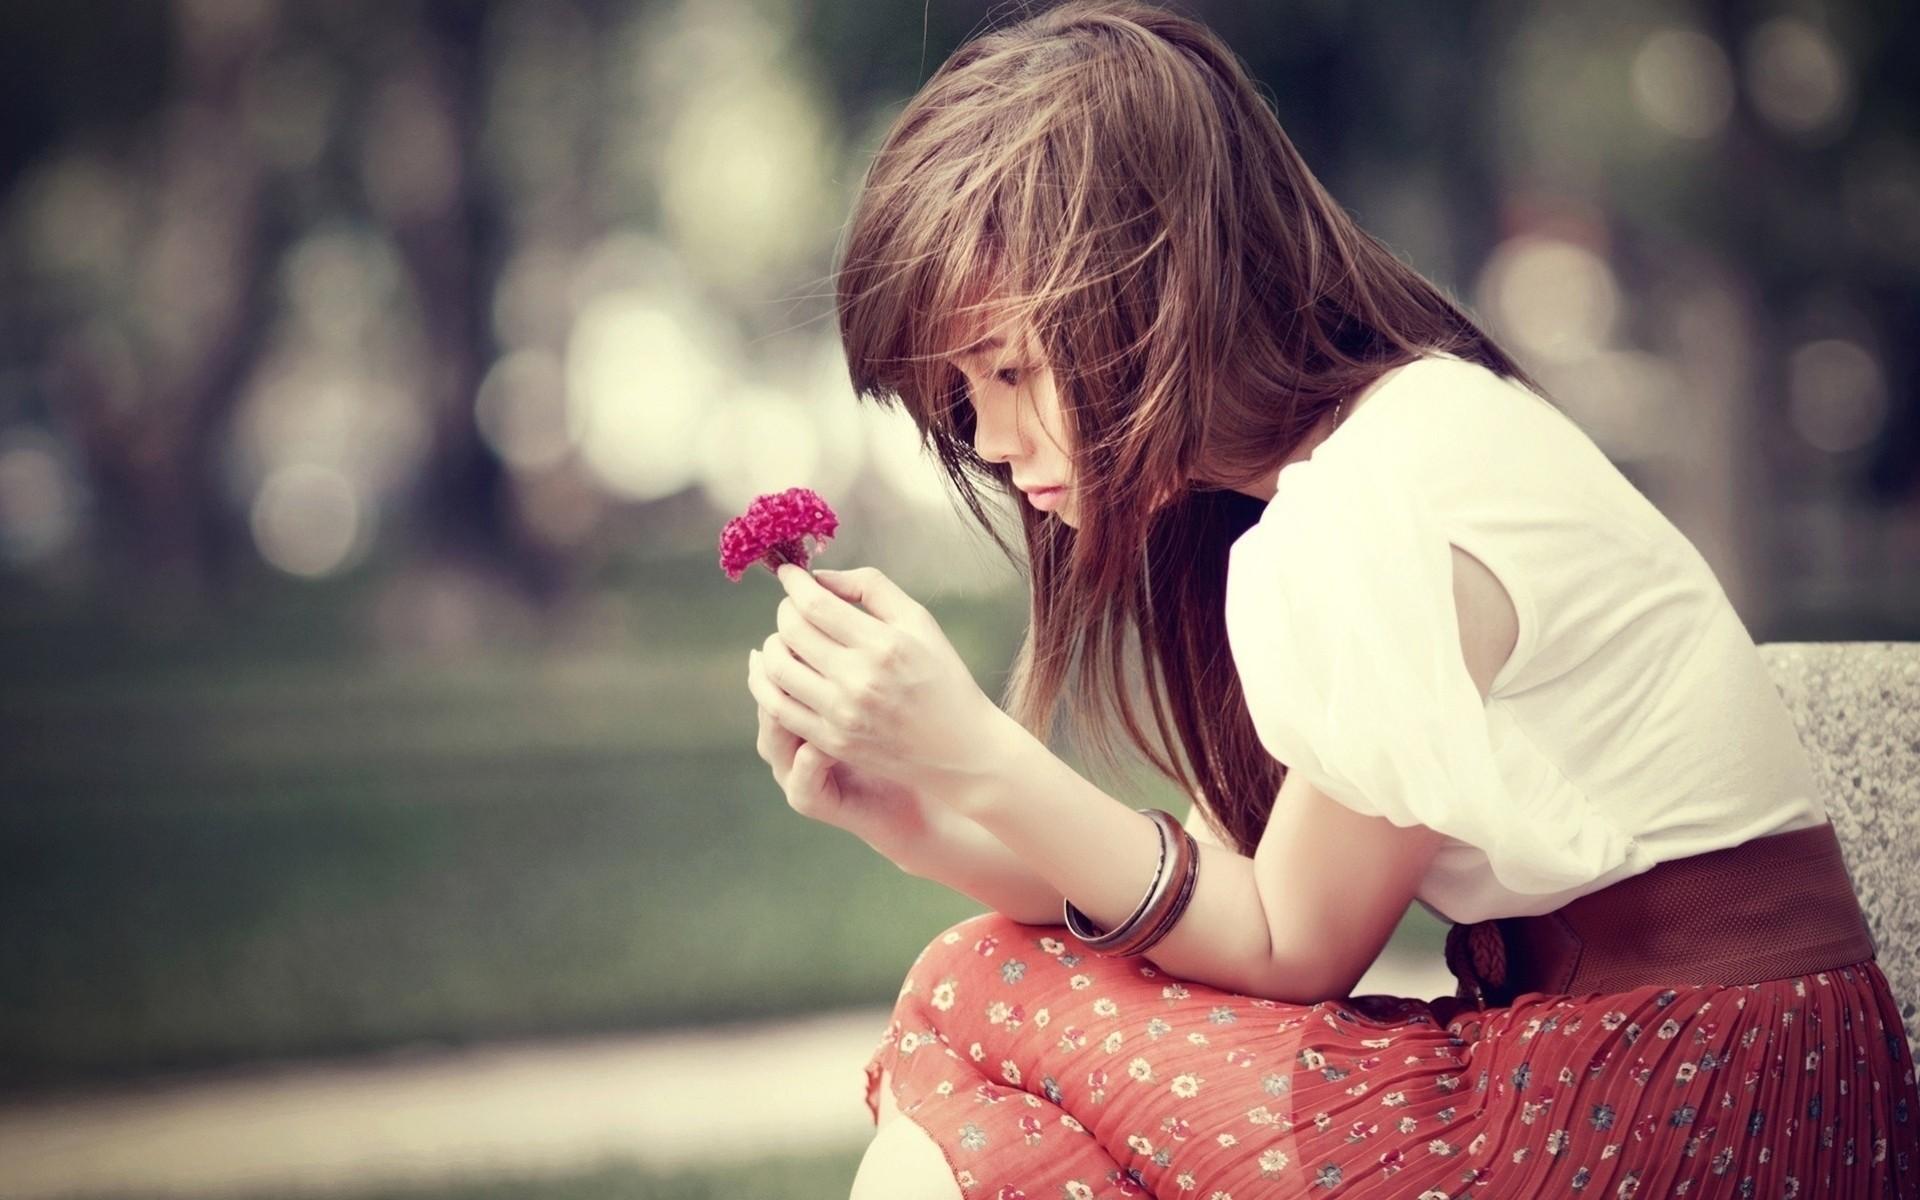 Картинки про любовь с надписями для девушки вацап